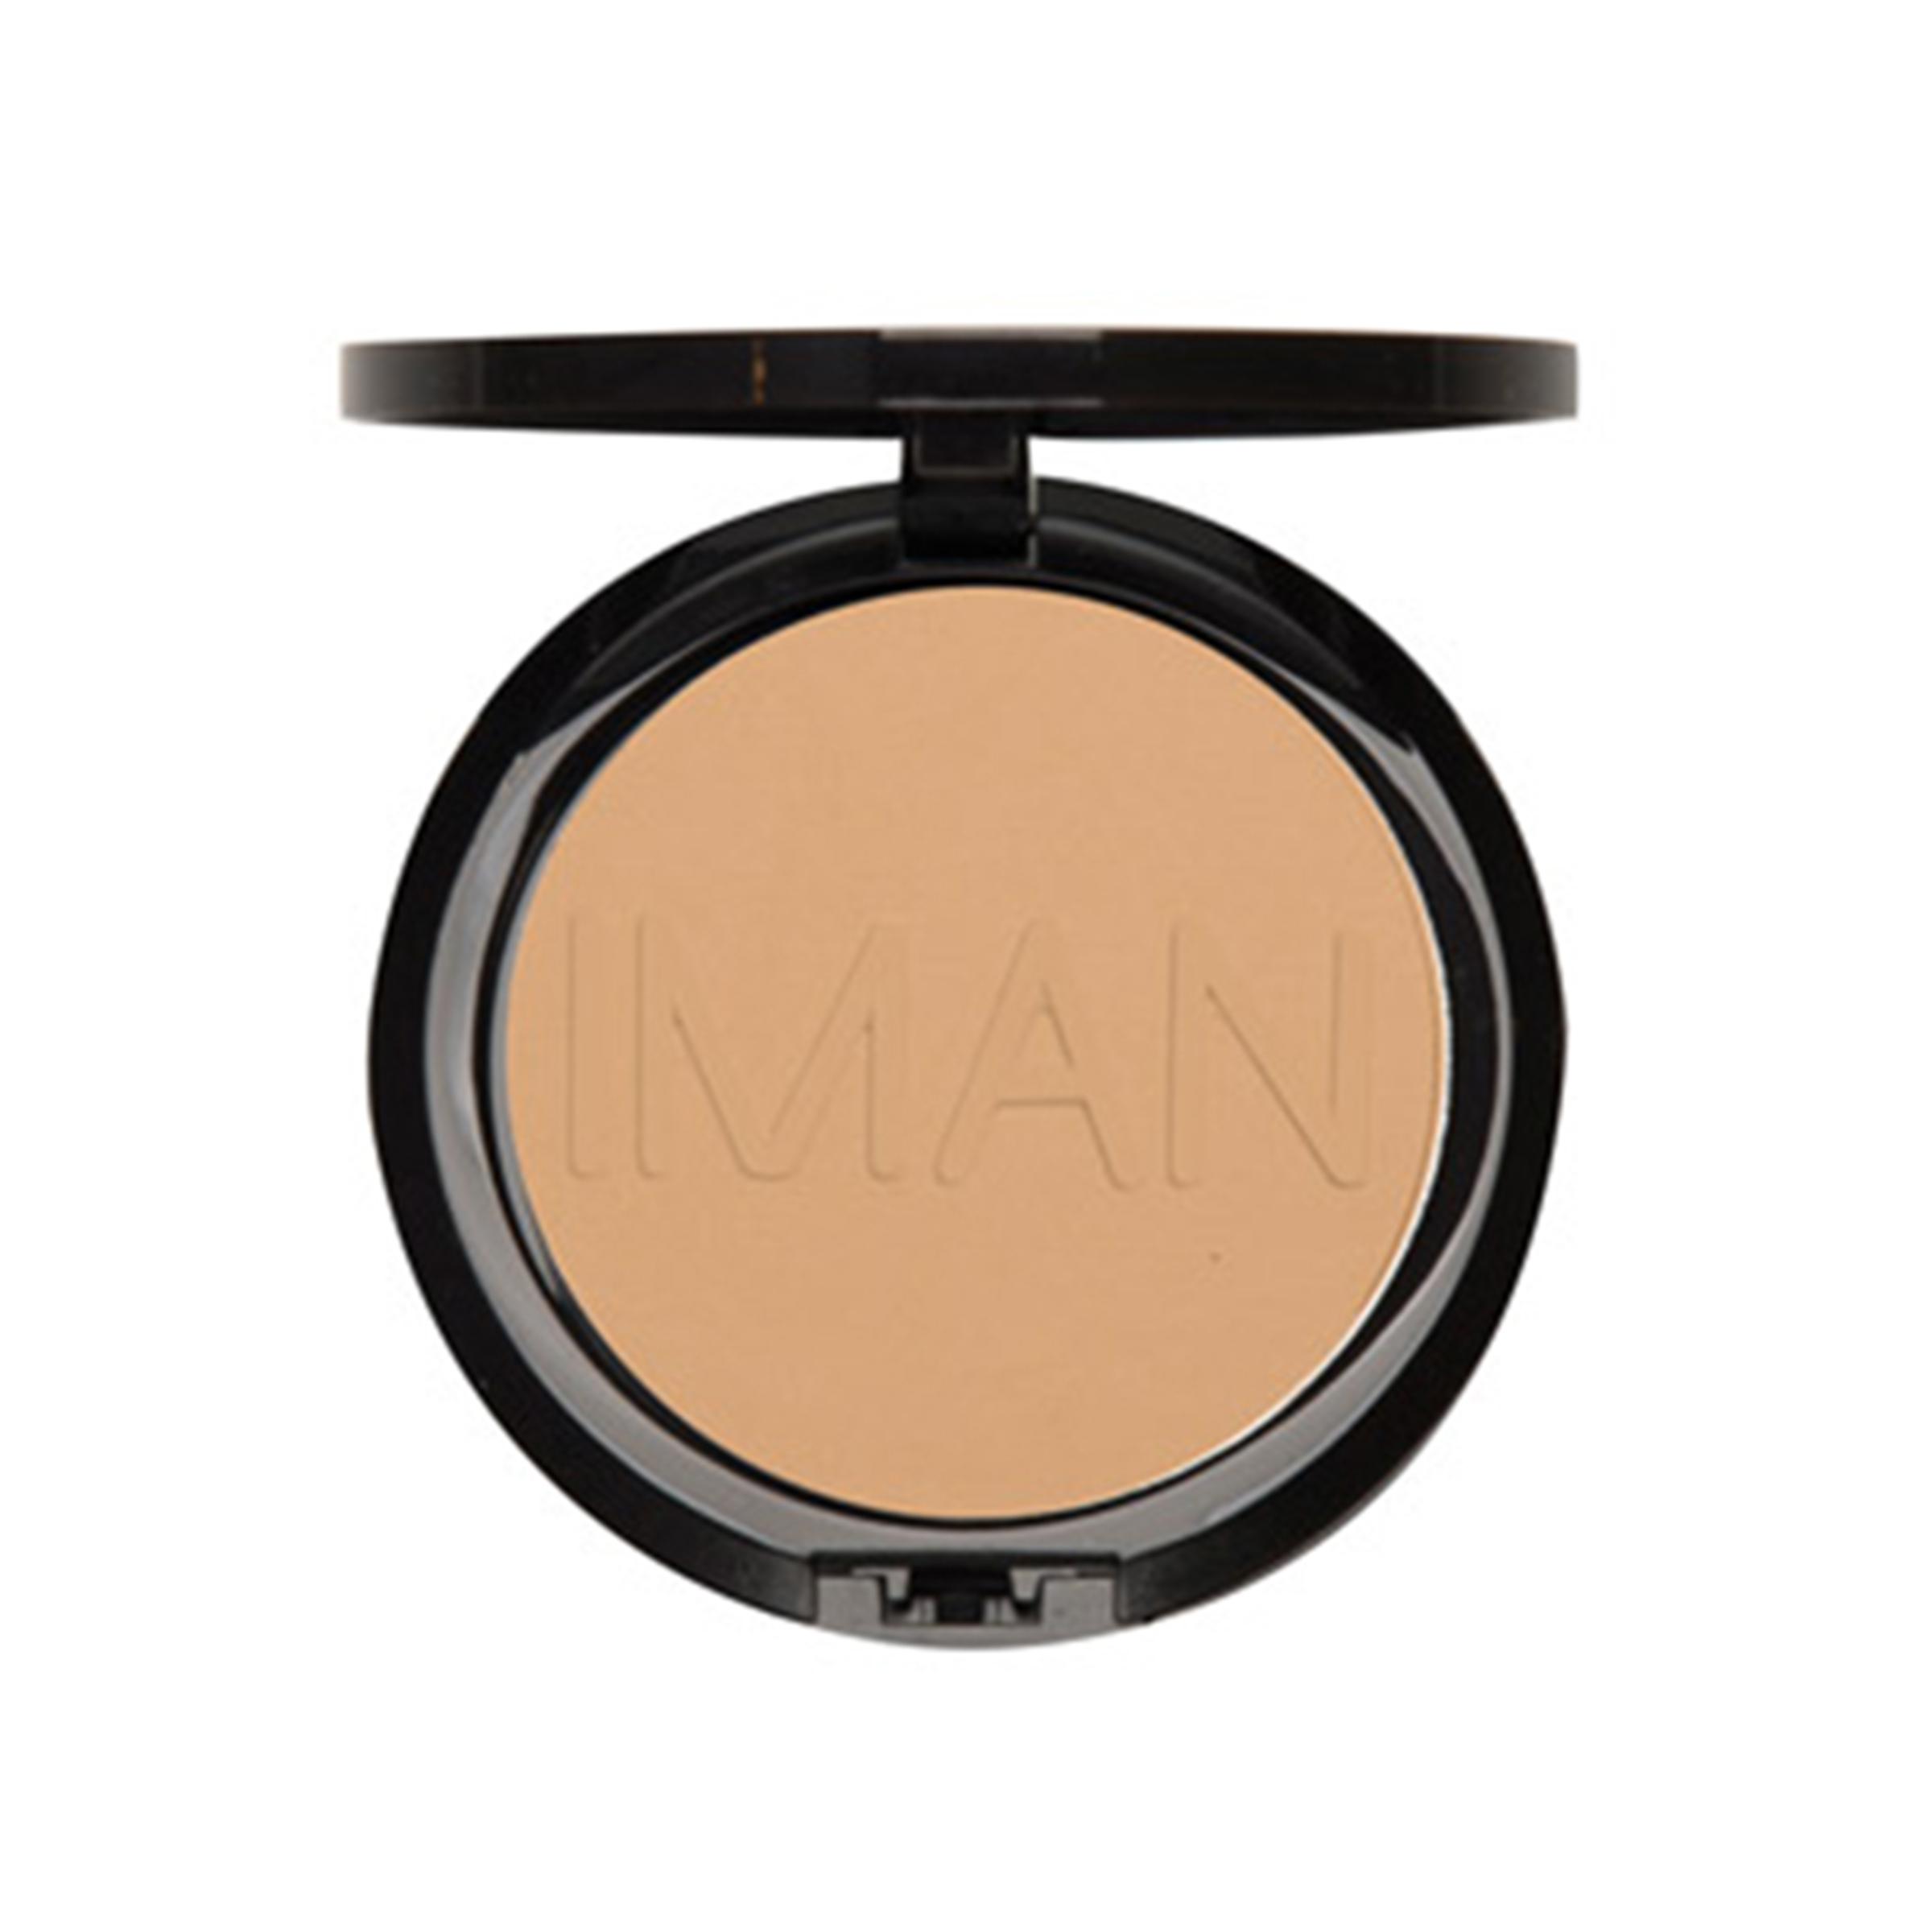 IMAN Luxury Pressed Powder, Clay Medium/Dark